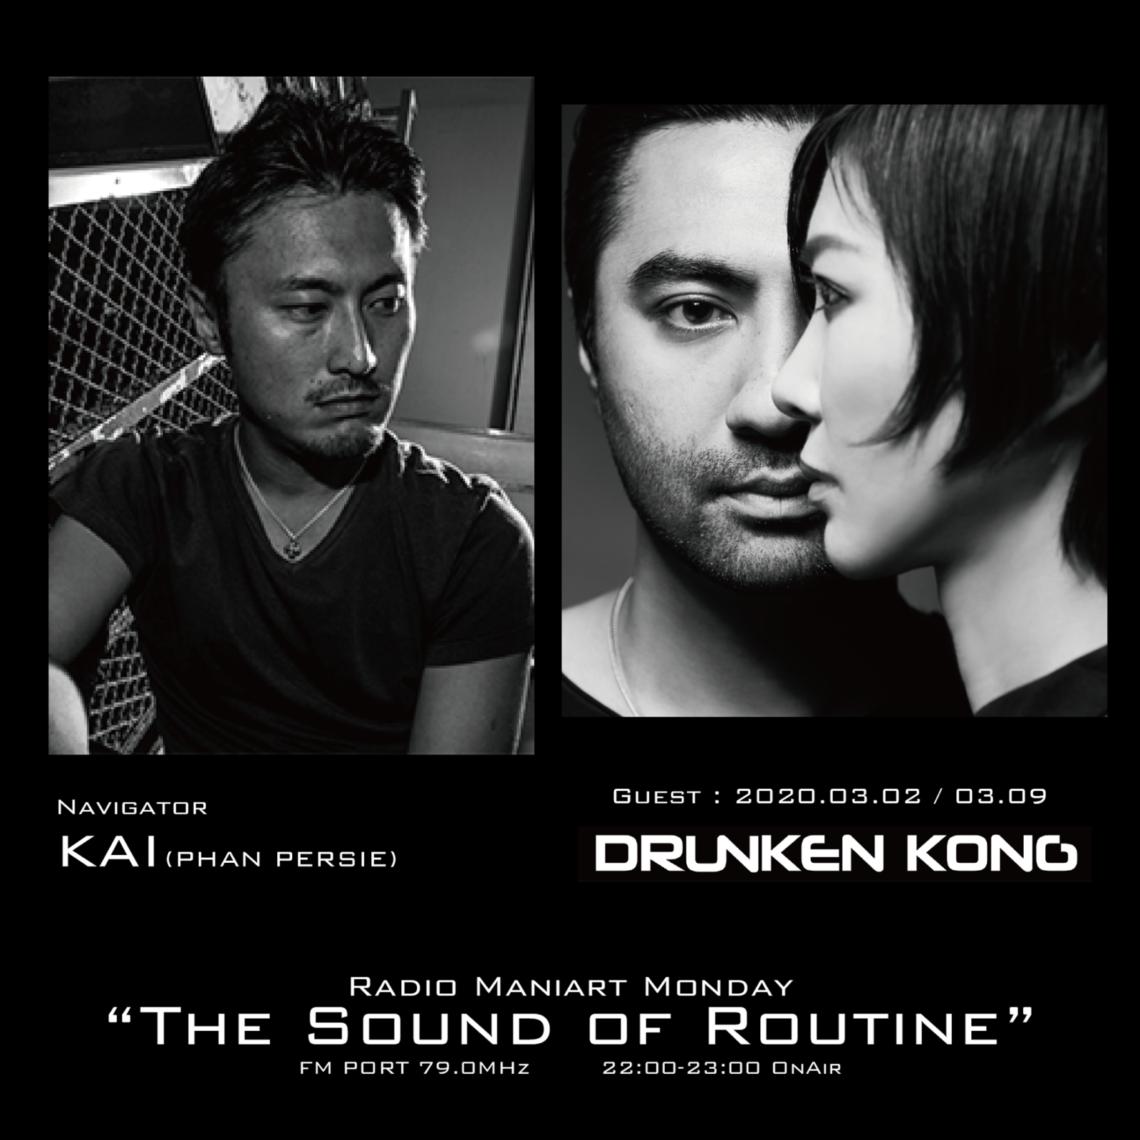 2020. 3. 2 MON, 3. 9 MON – KAI : Navigator on FM PORT / the Sound of Routine – Guest : DRUNKEN KONG ( Tronic/Terminal M )